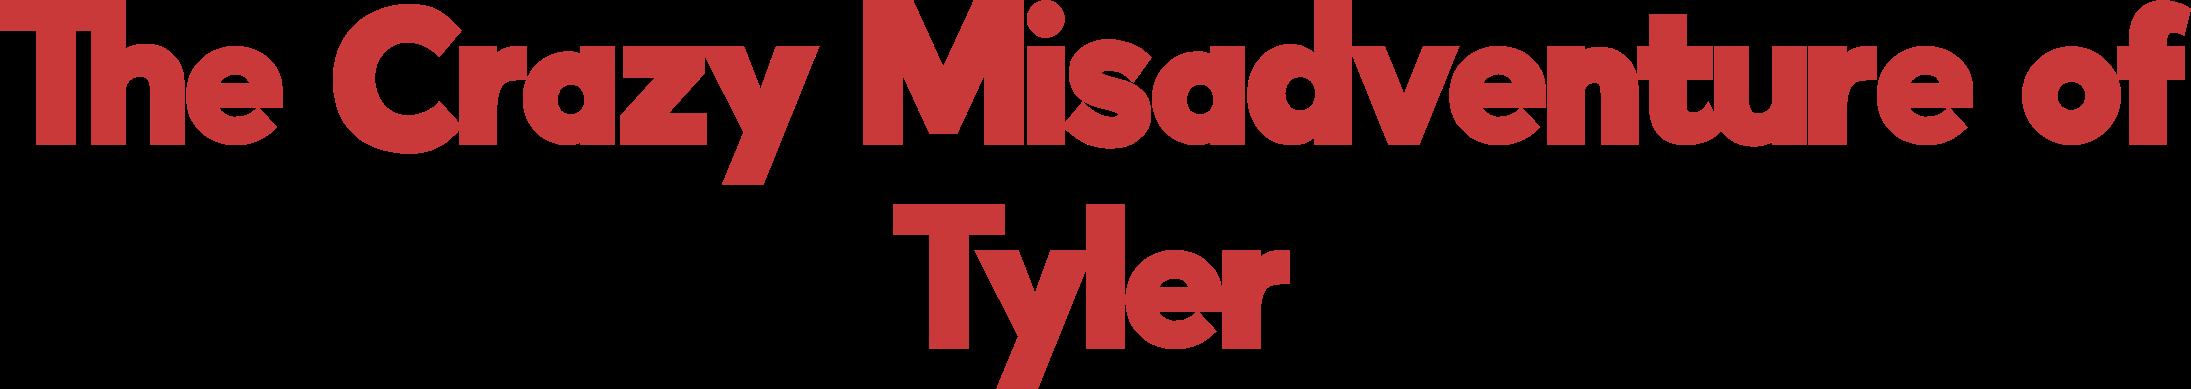 The Crazy Misadventure of Tyler